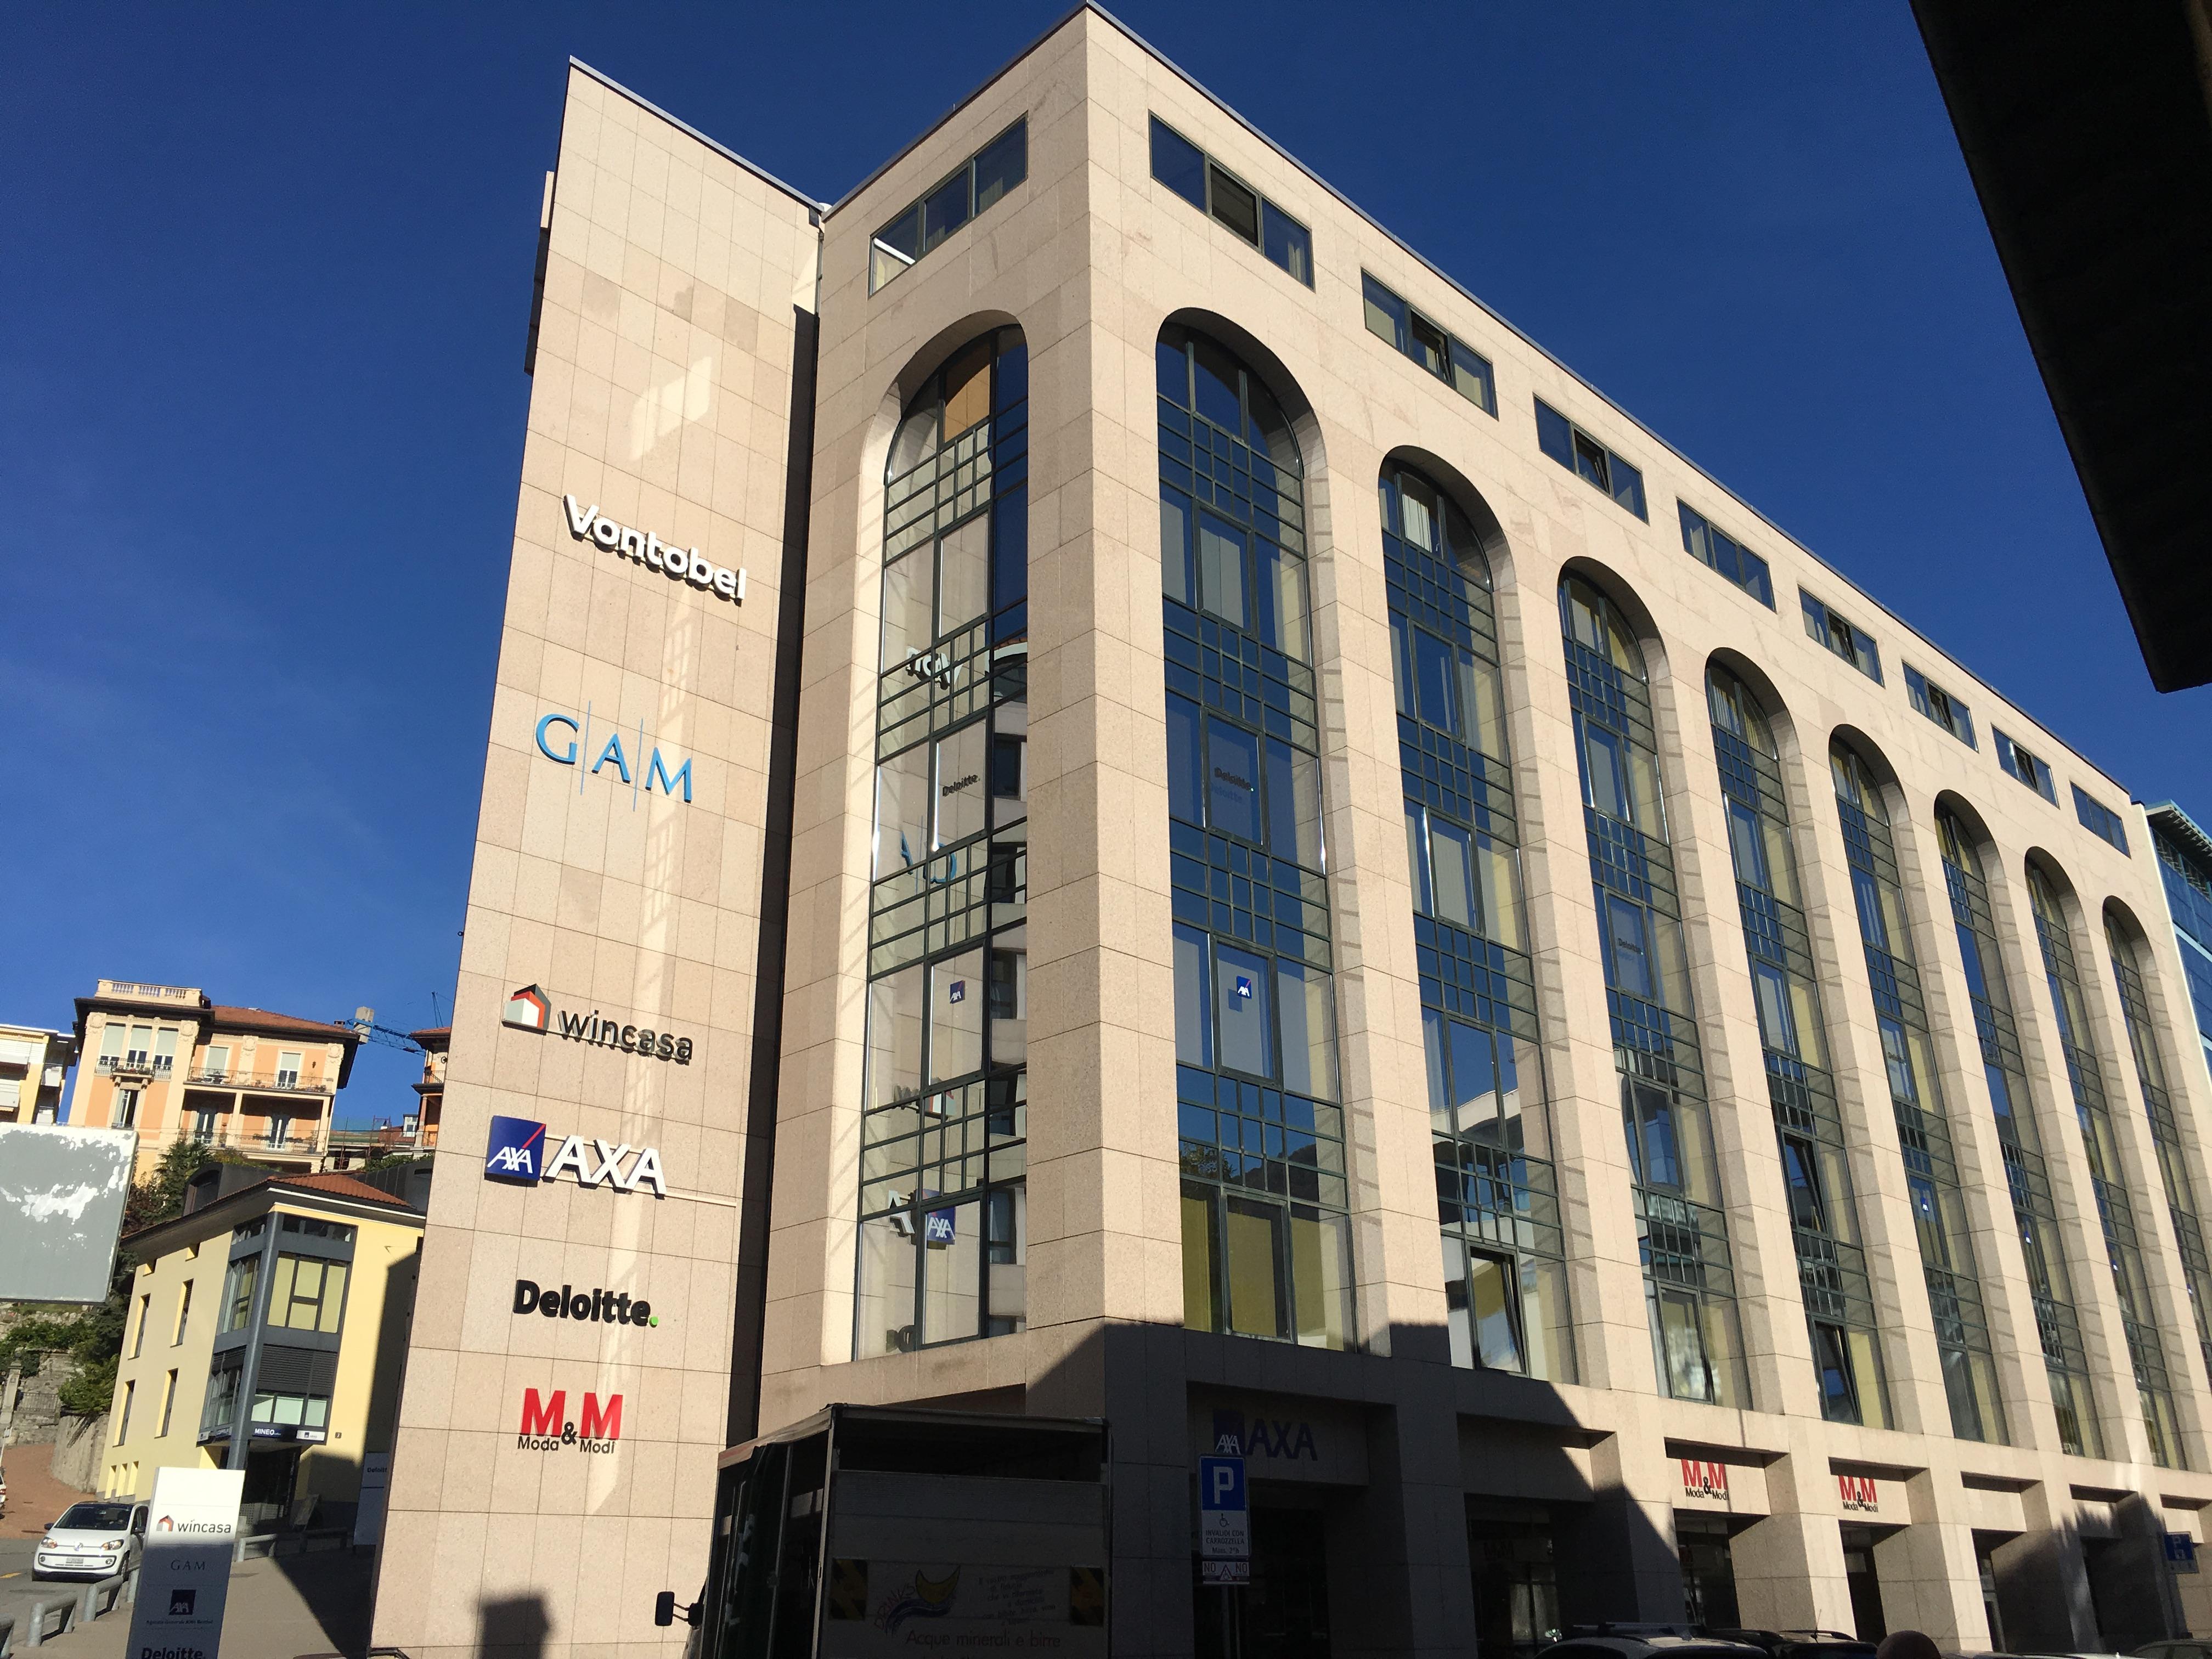 Lugano - Stabile AXA - Via Pelli & Via C